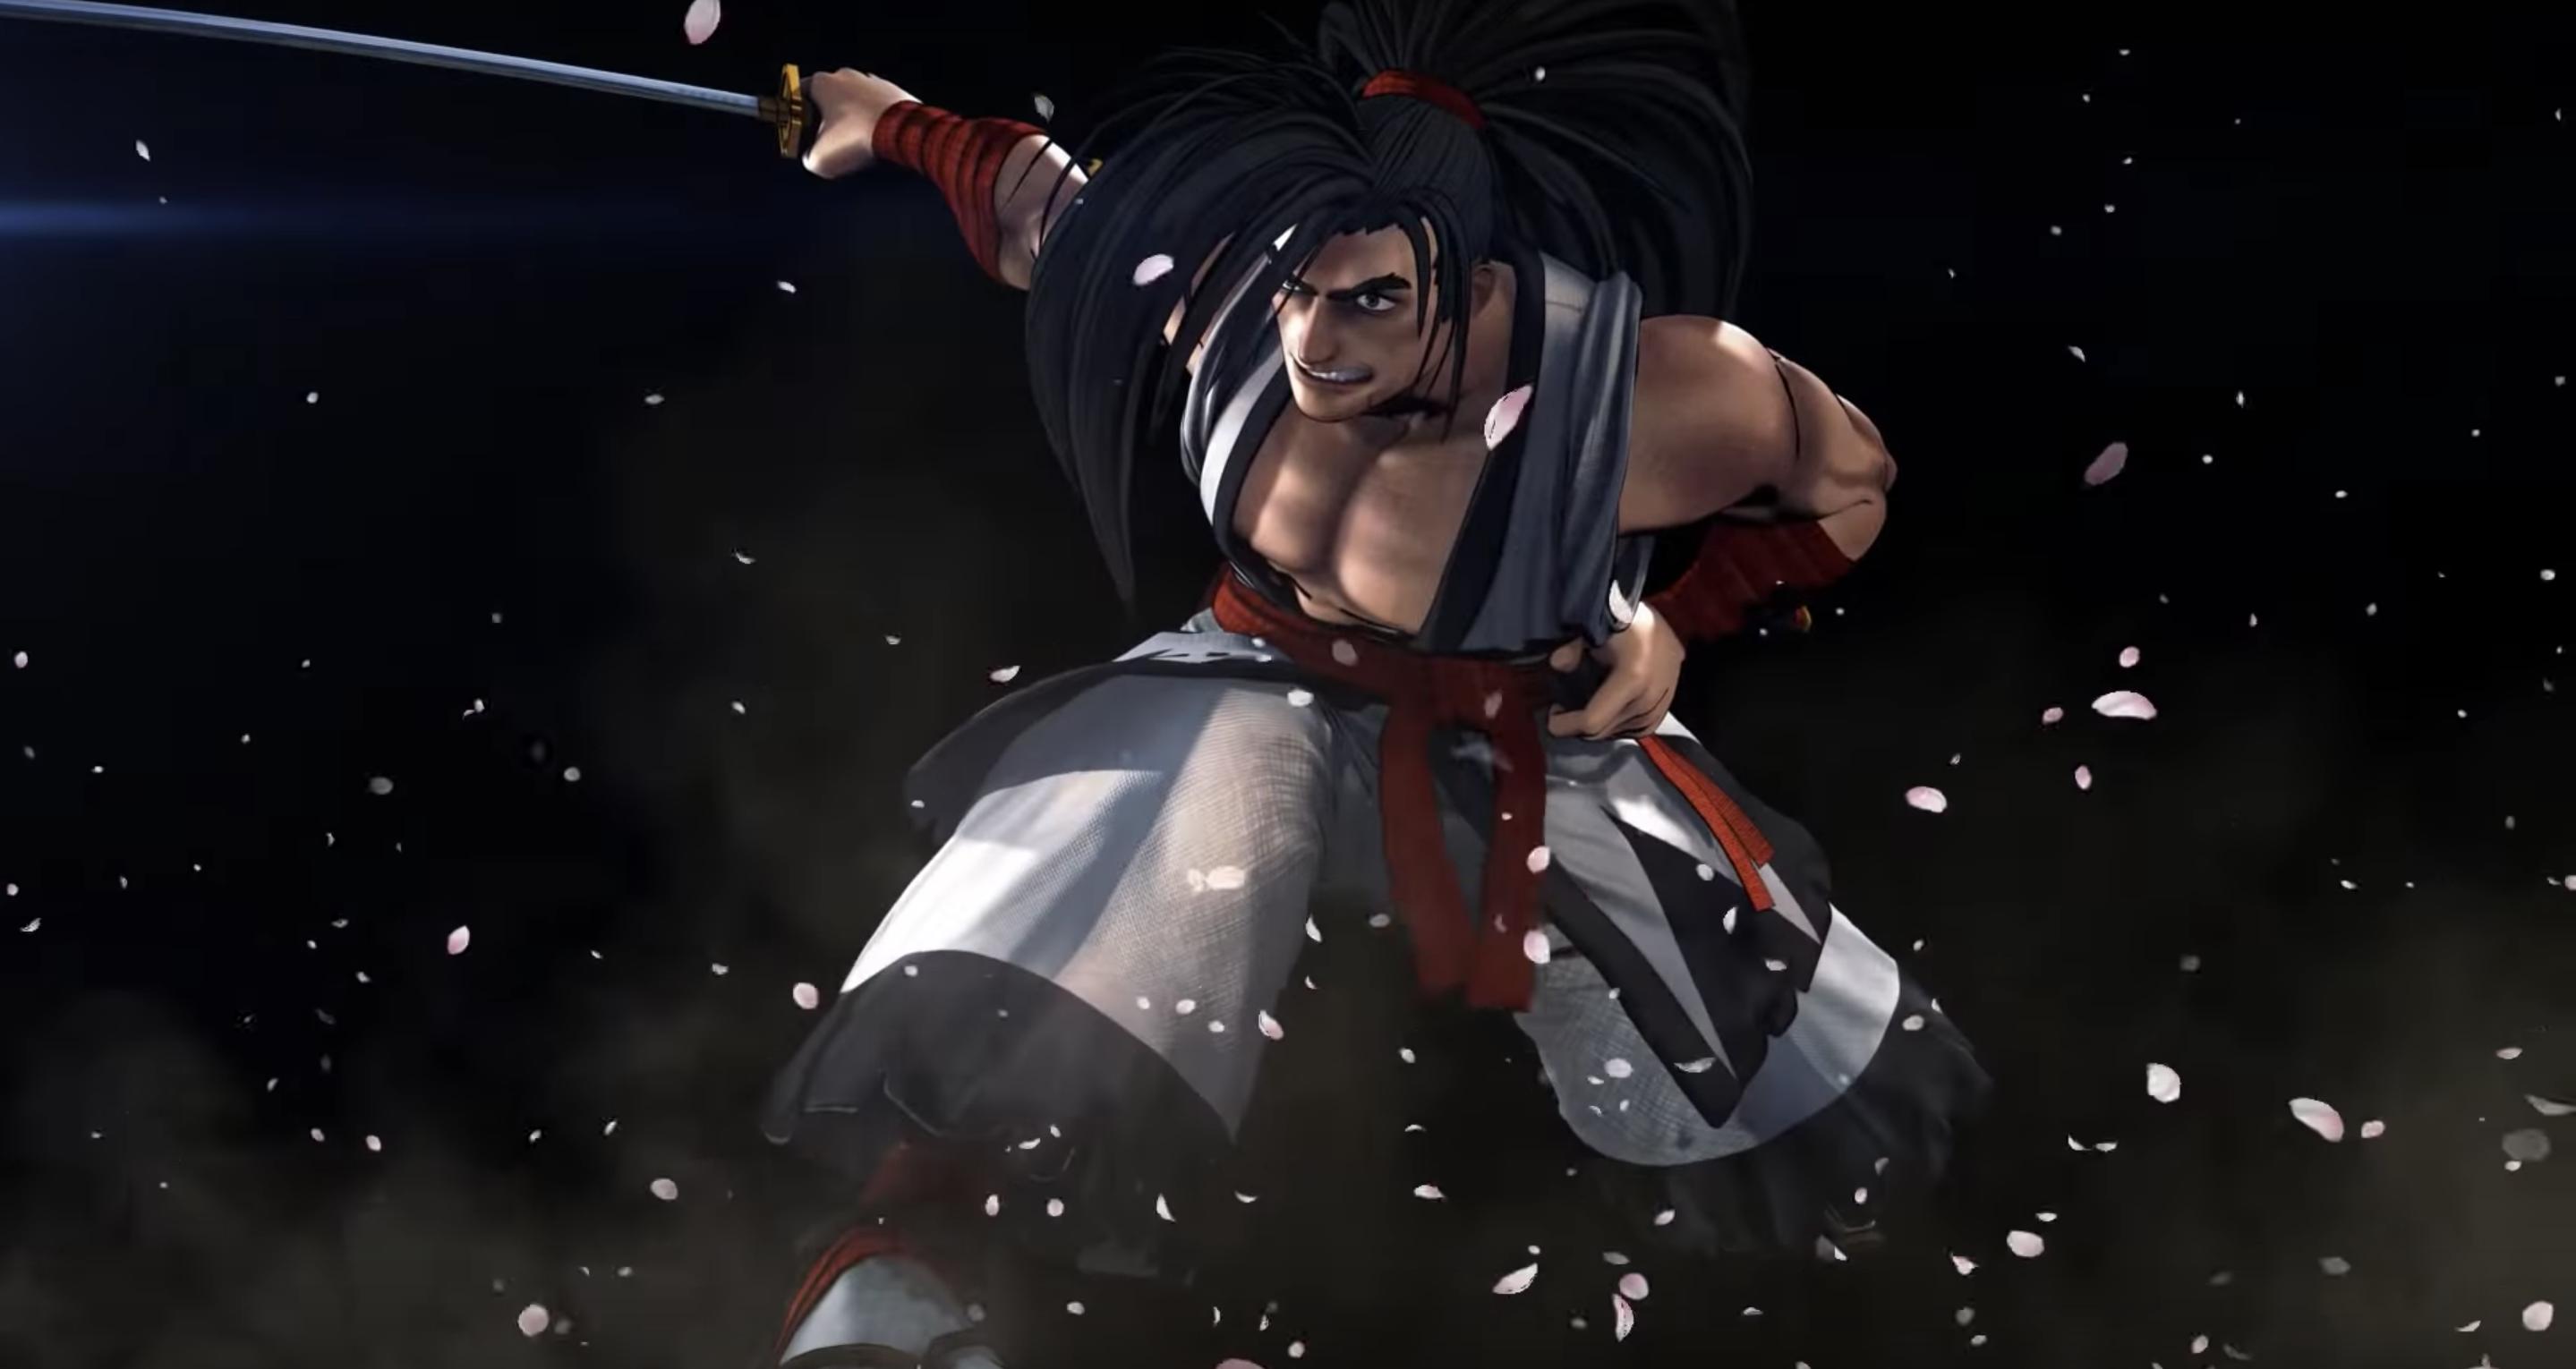 New Samurai Shodown is heading to PS4 next year - Polygon